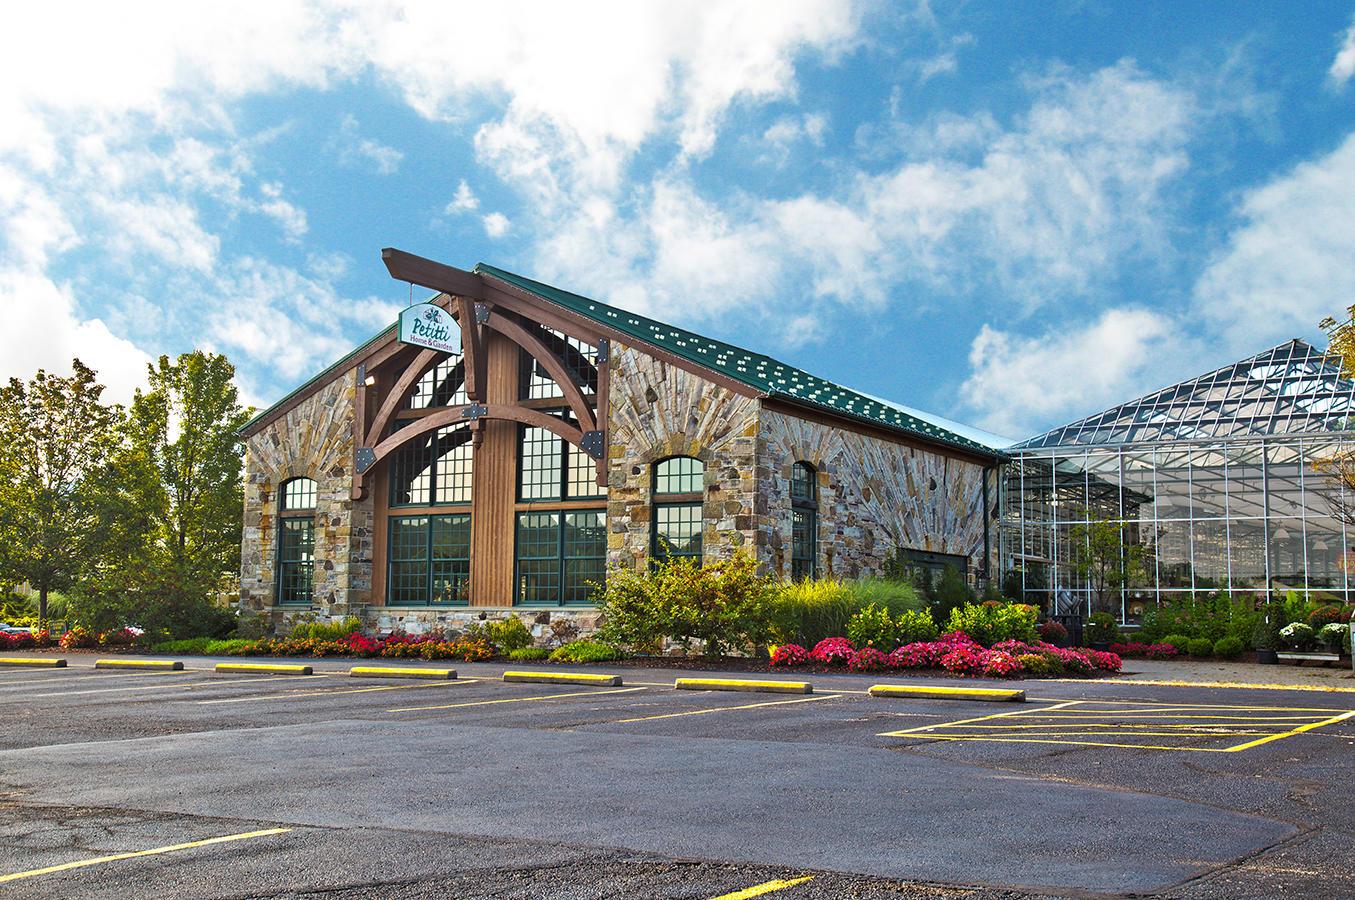 Petitti Garden Centers 18548 Chillicothe Road Bainbridge, OH Garden Centers    MapQuest